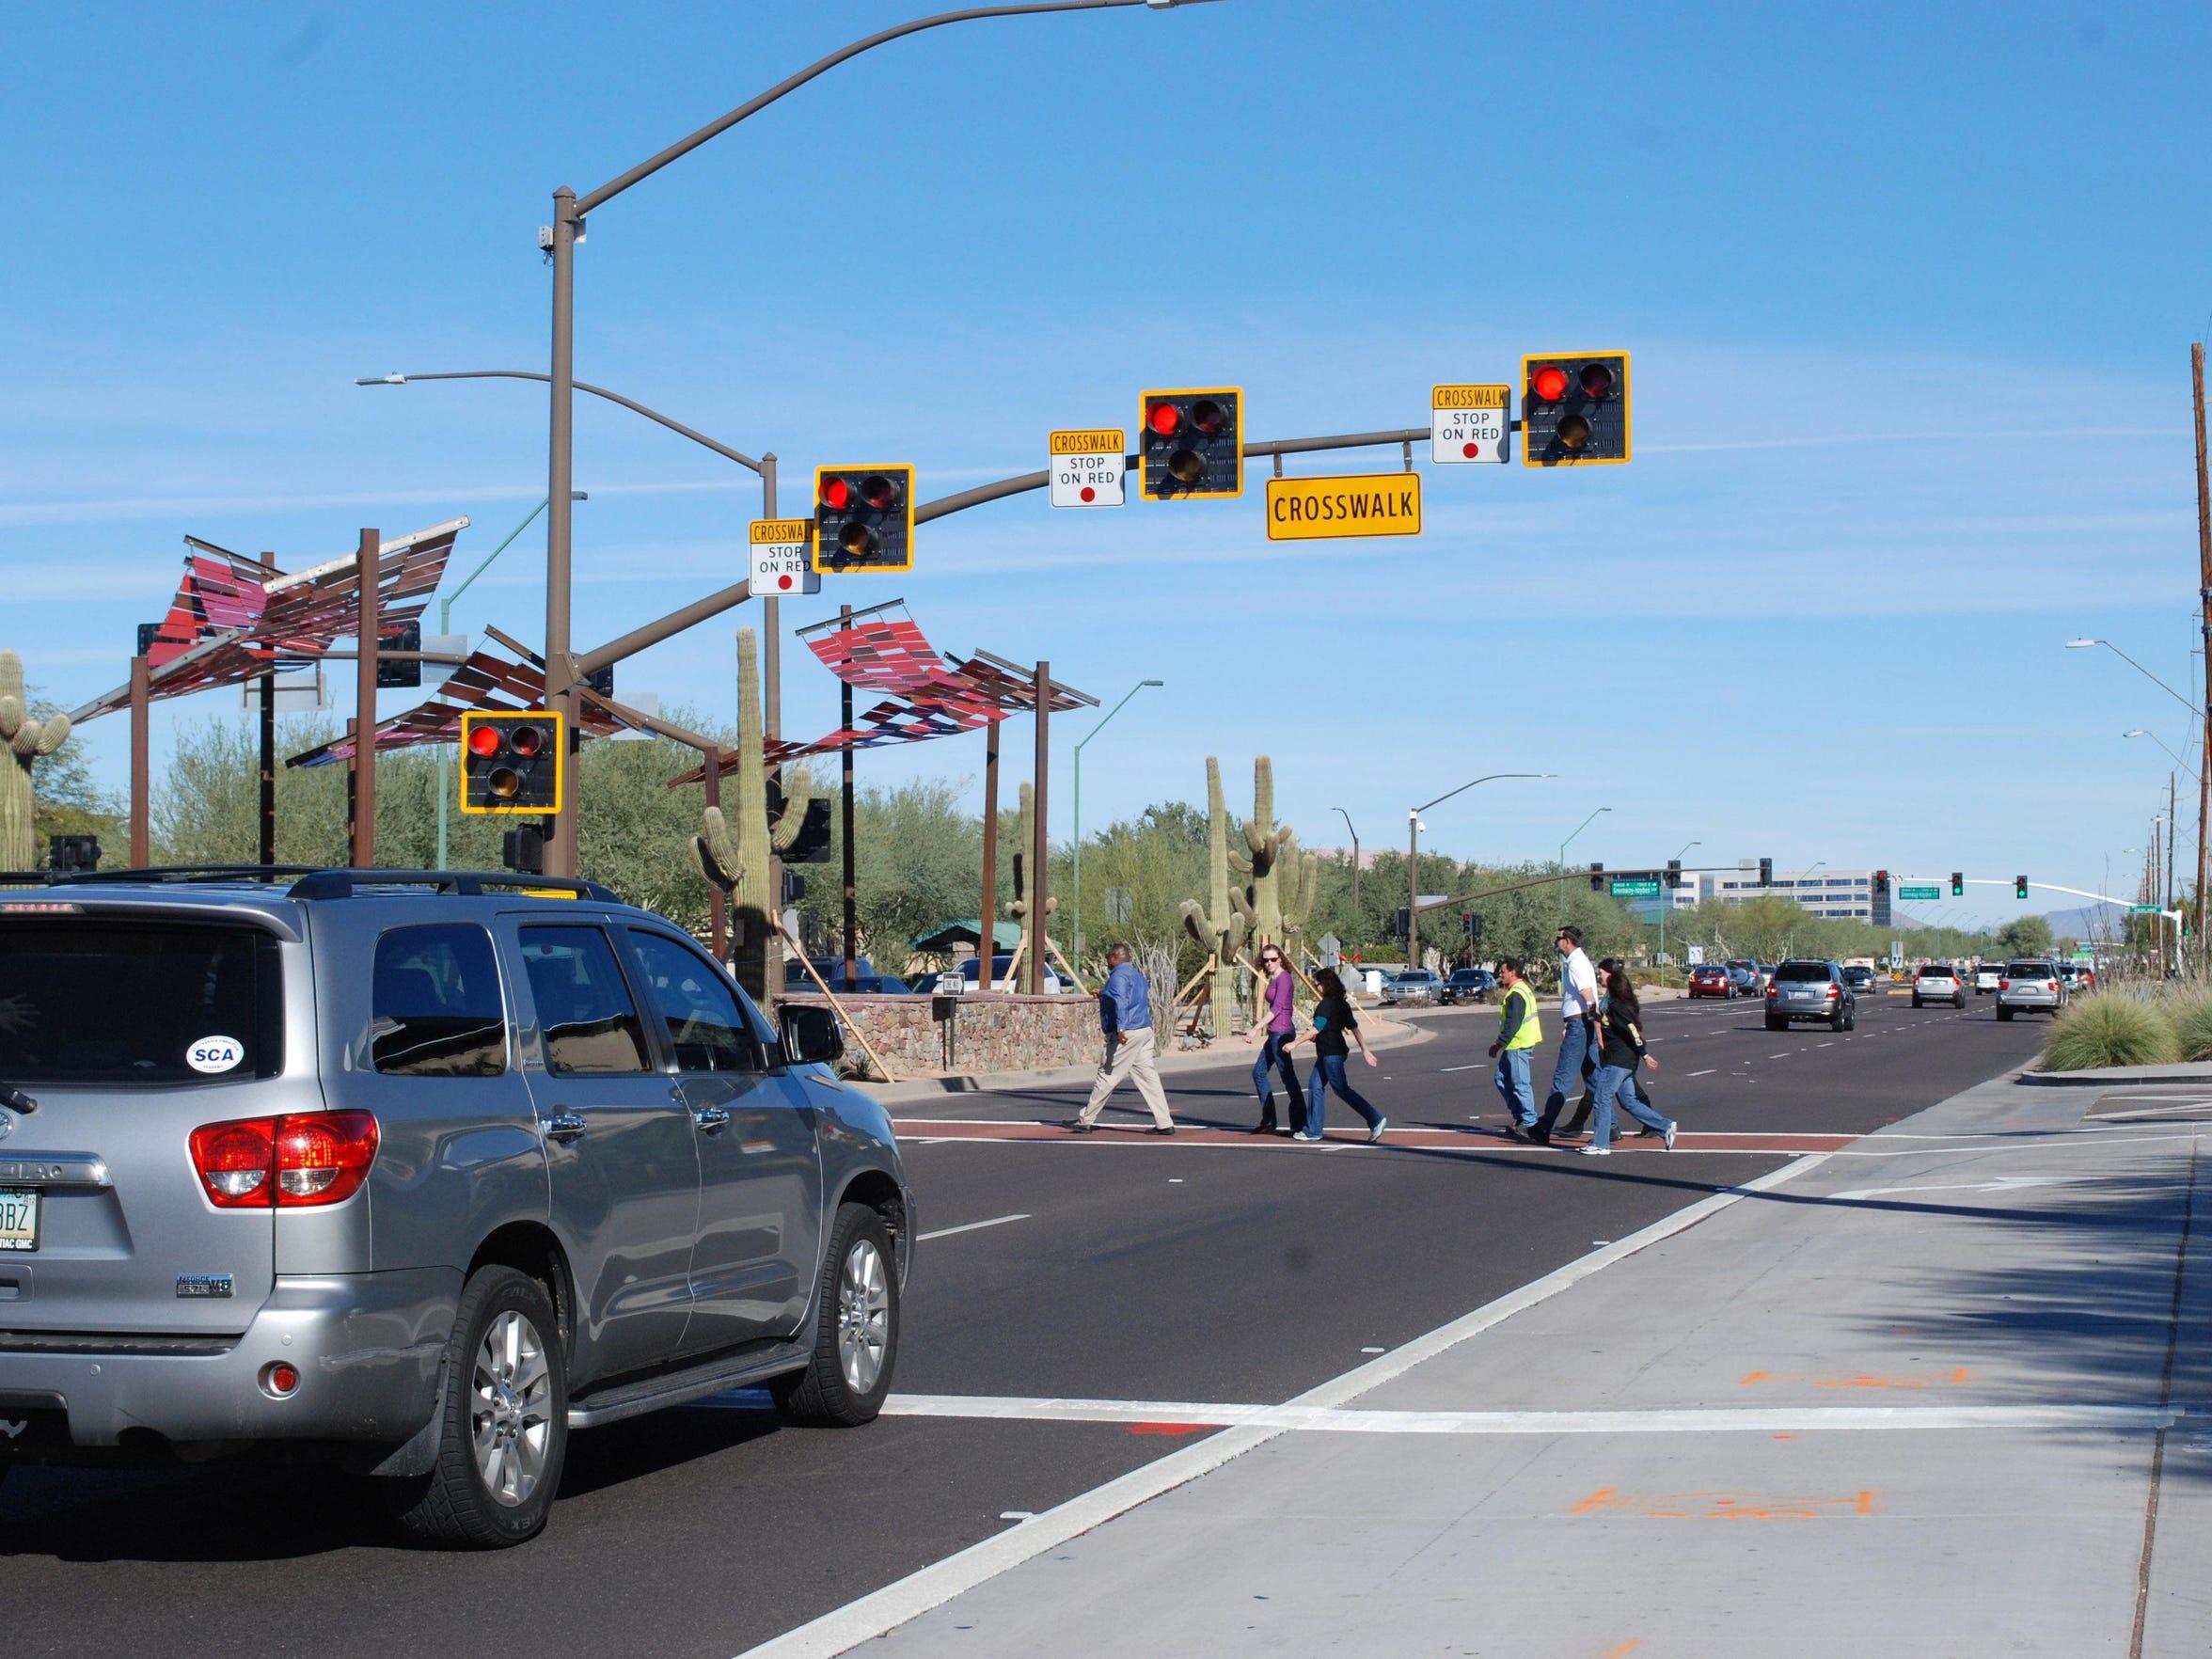 Scottsdale Road Pedestrian Hybrid Beacon with pedestrians in the crosswalk (